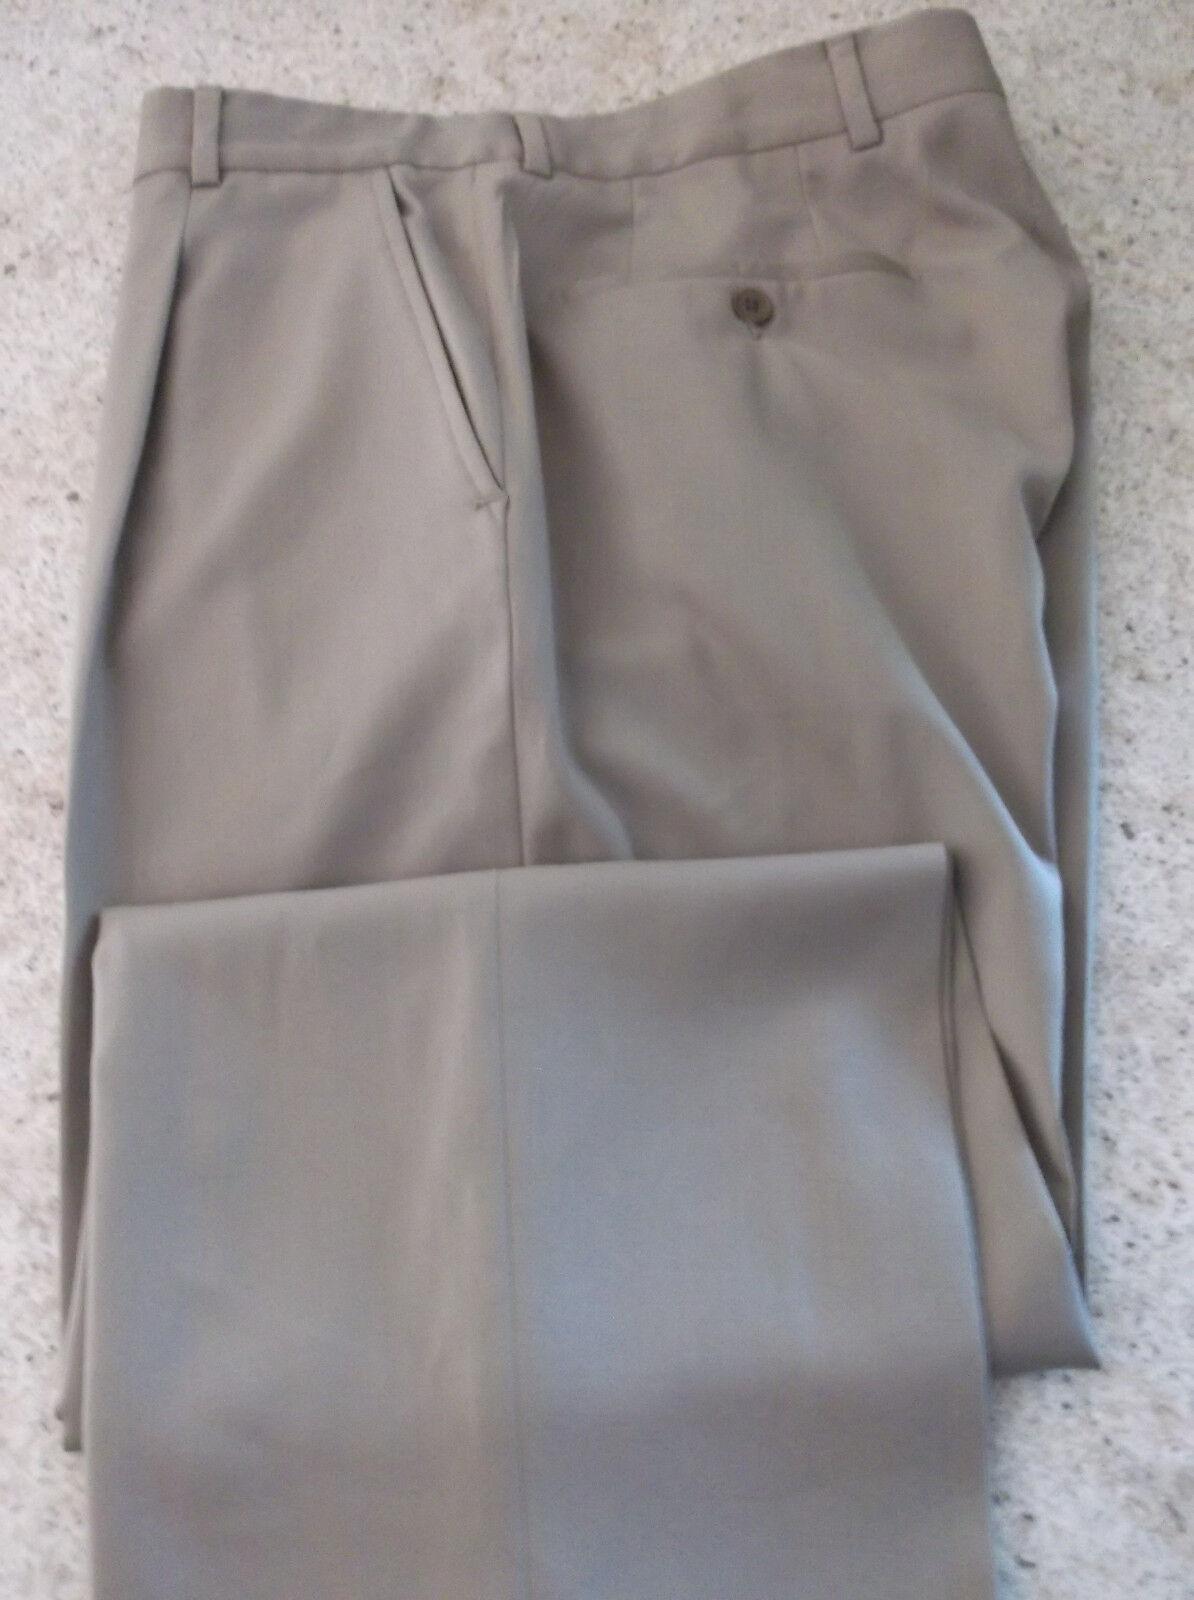 HUGO BOSS Khaki color Pleated Front Dress Pants size 32 W 32 L